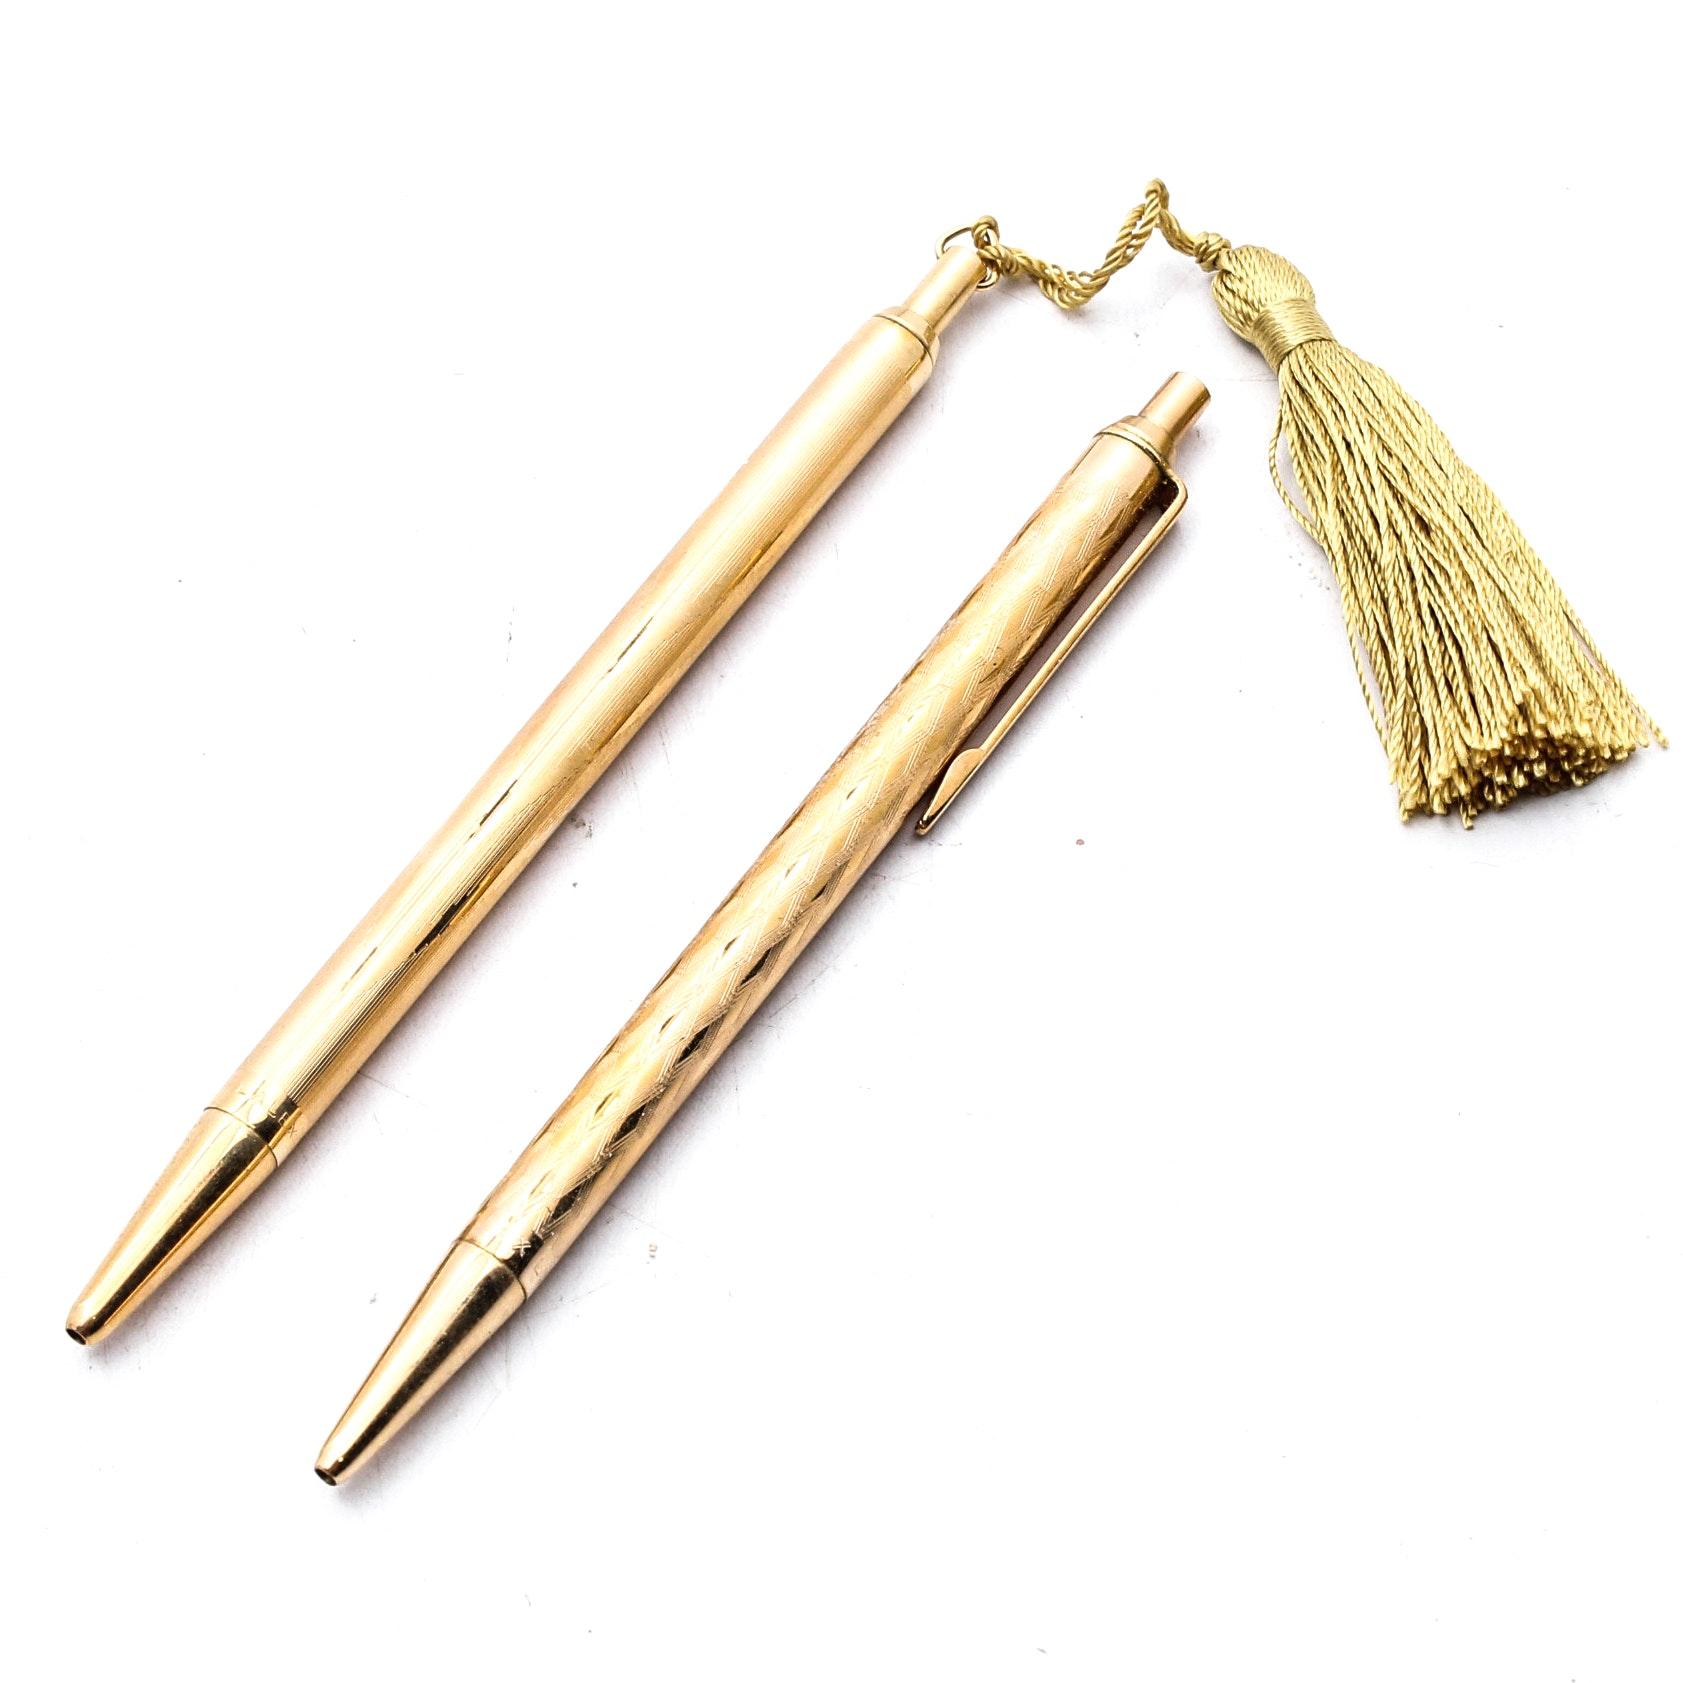 Lalex Gold Filled Pens